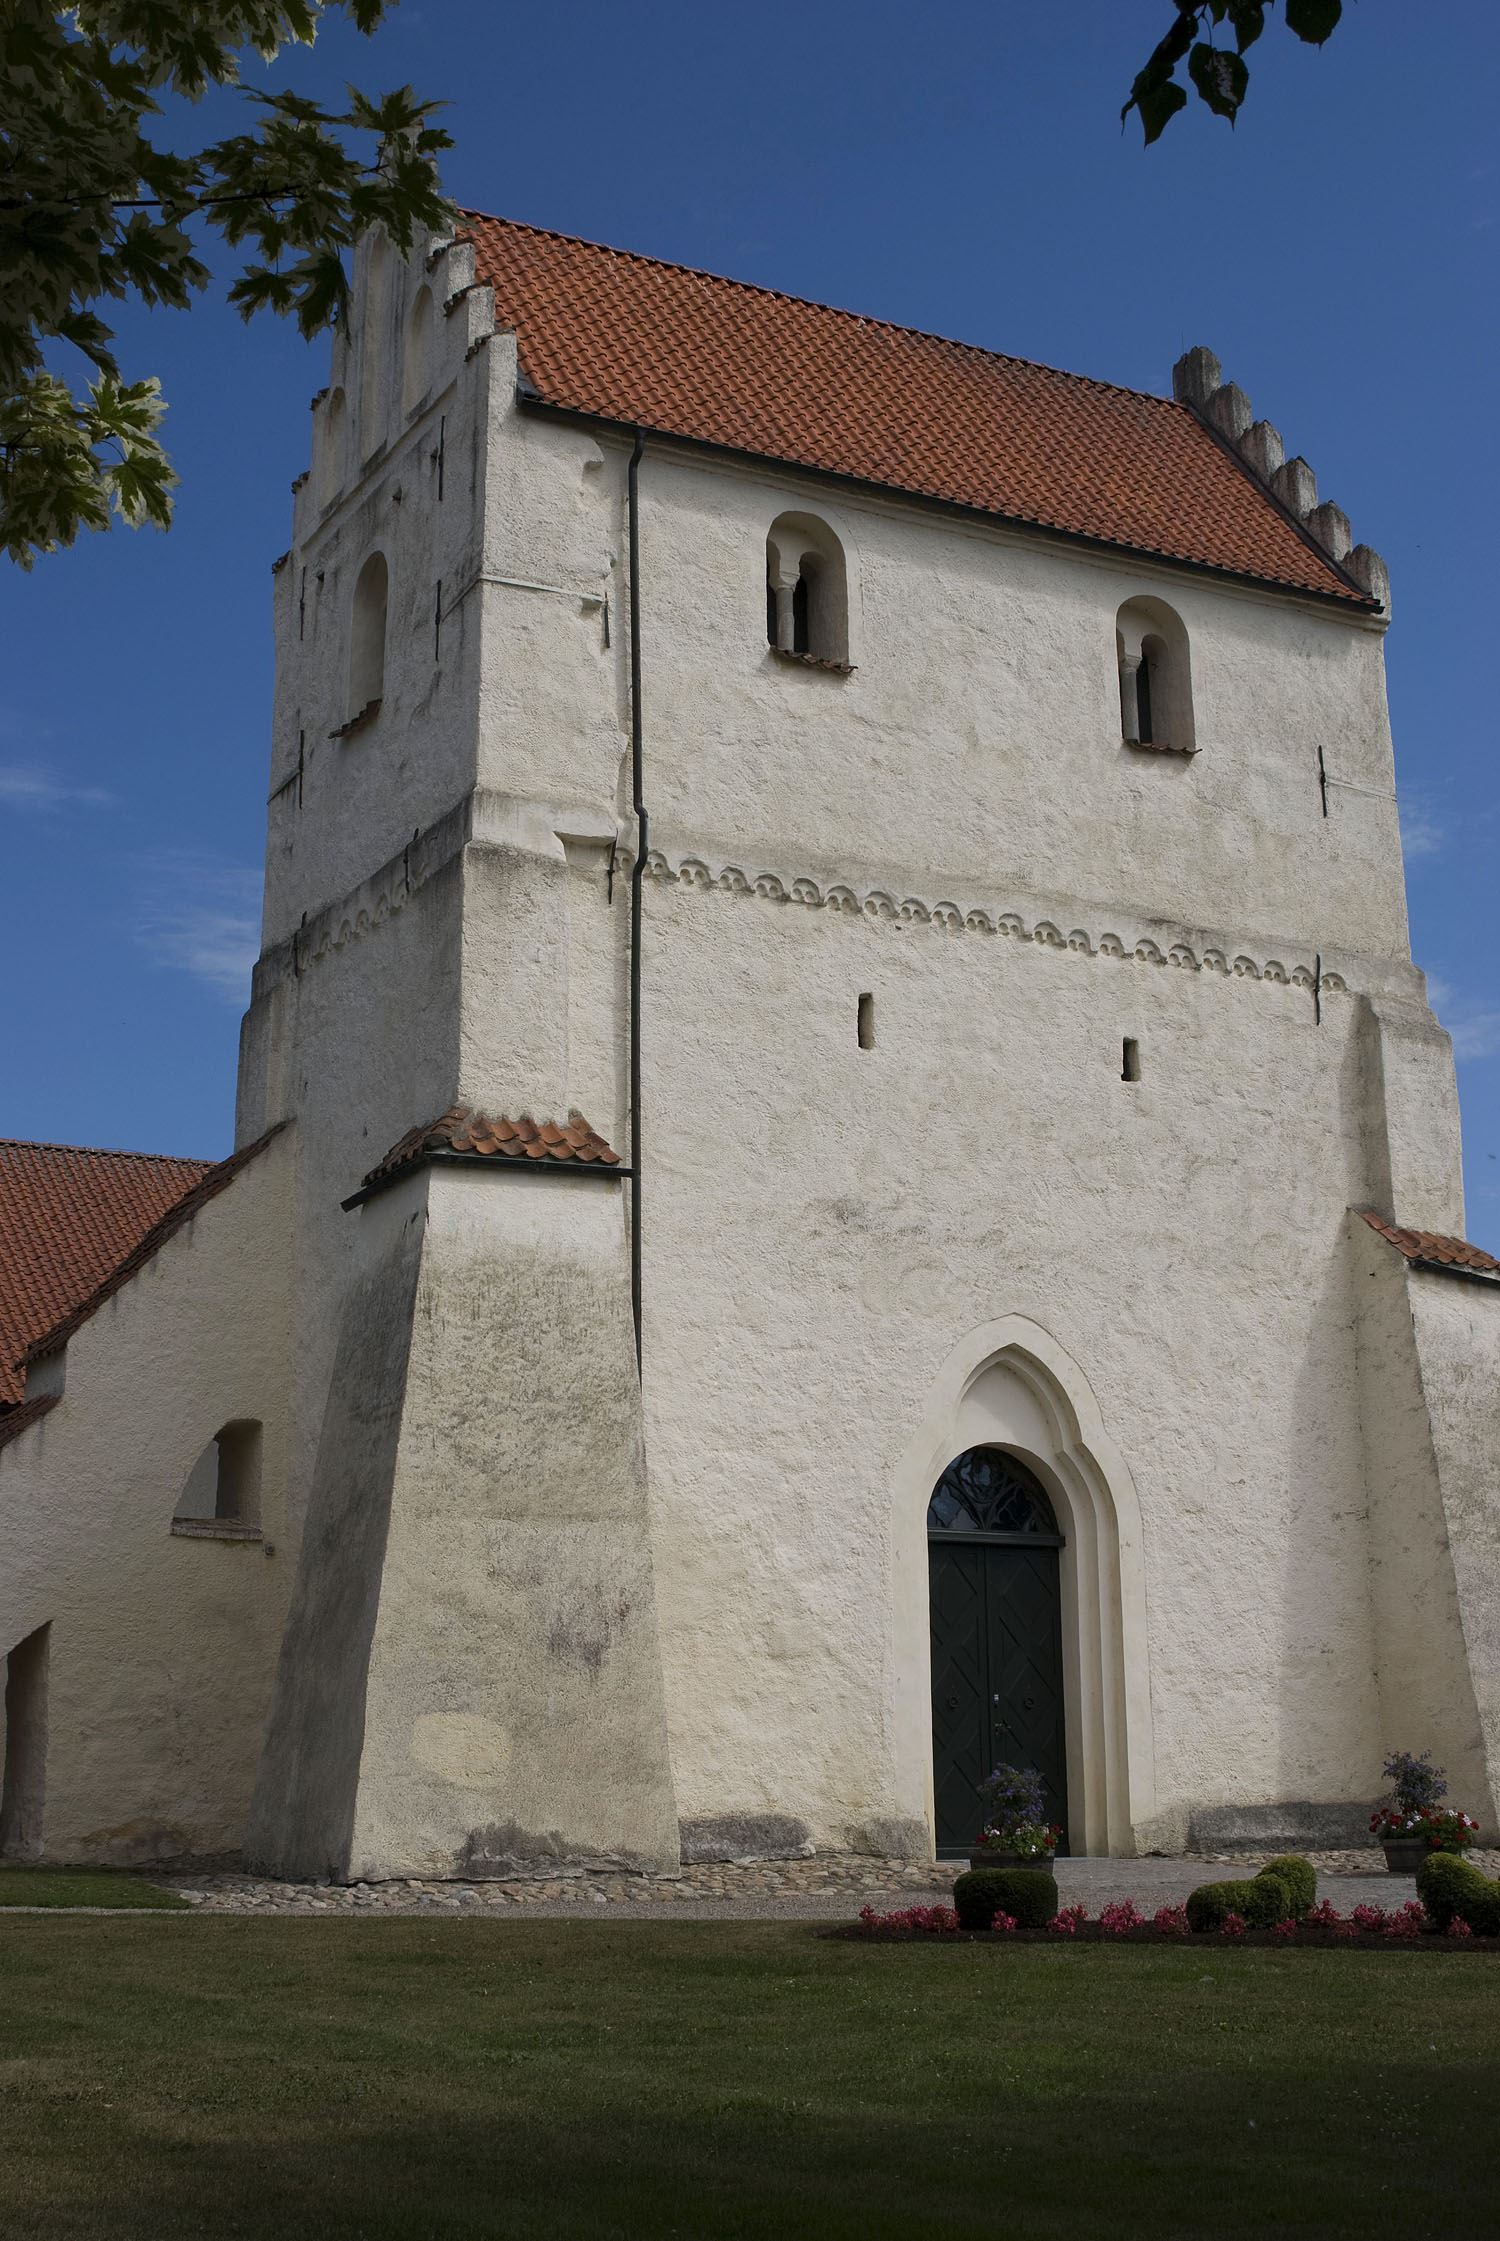 Tobias Delfin, Ivetofta kyrka